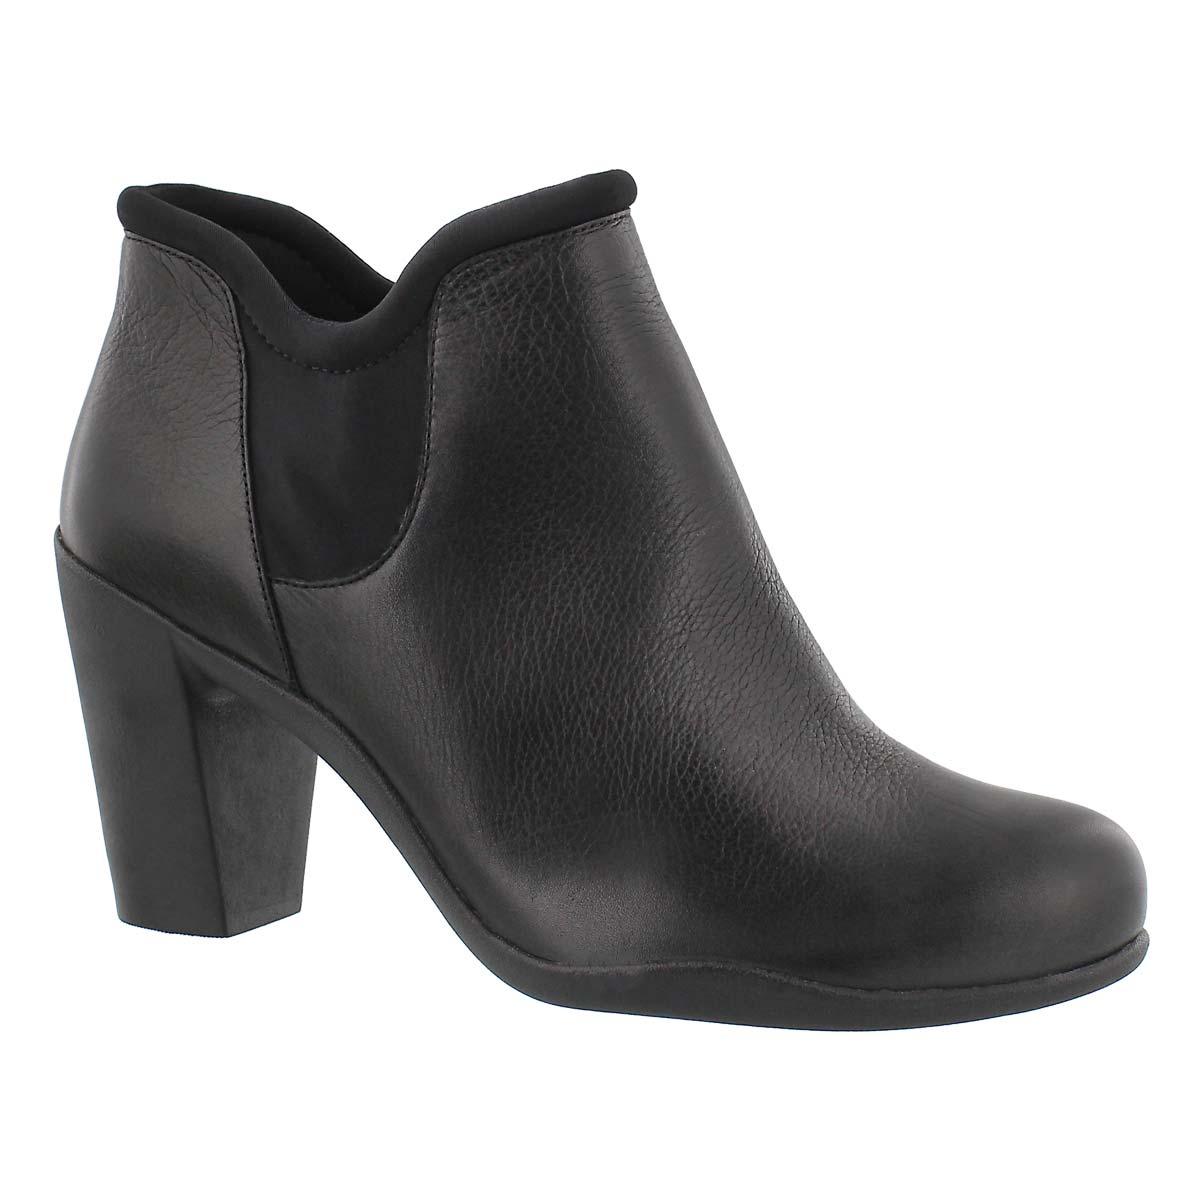 Women's ADYA BELLA black dress booties